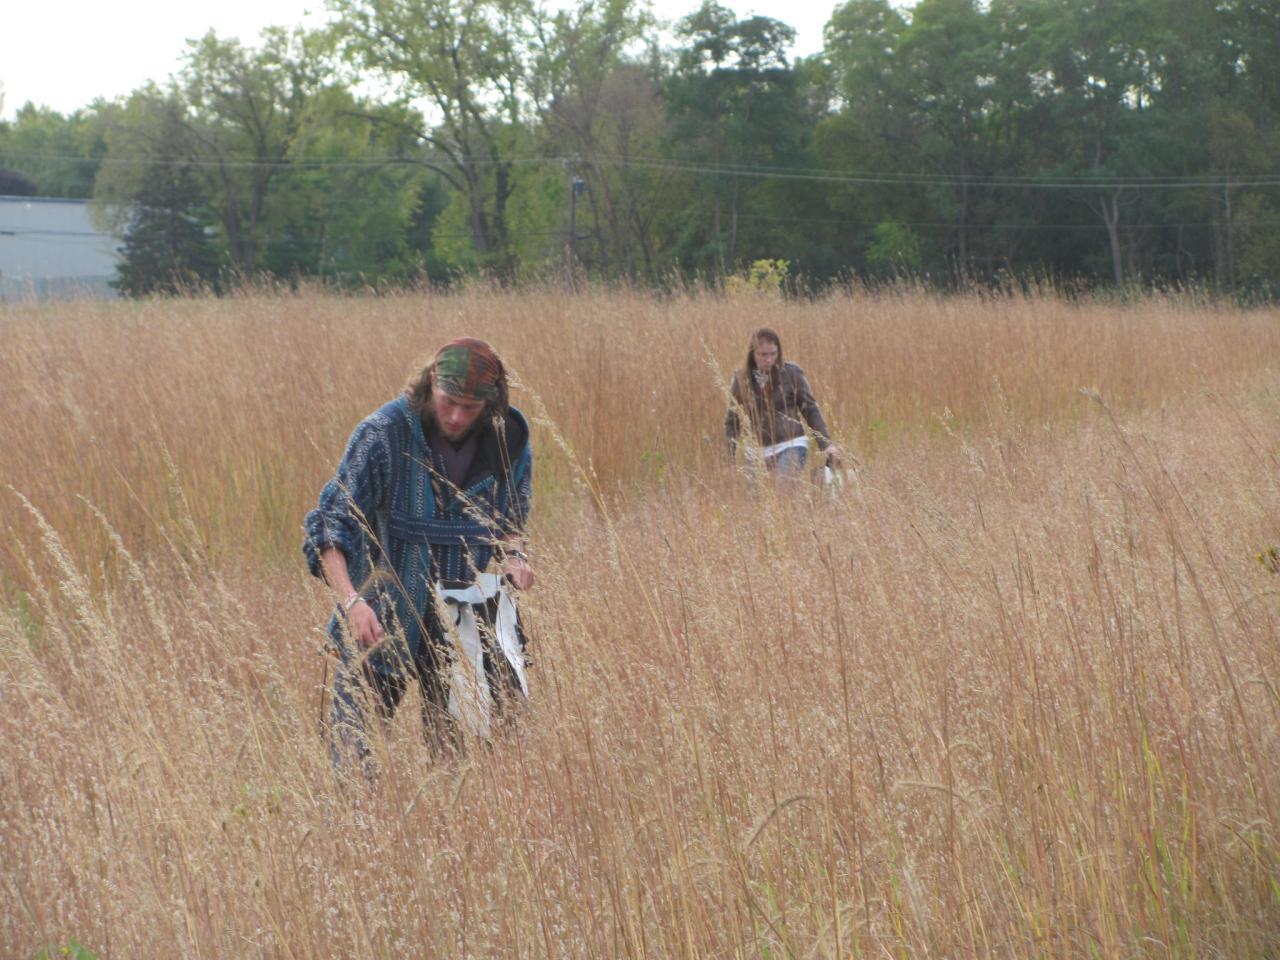 Volunteers collecting native seed at Heritage Village Park